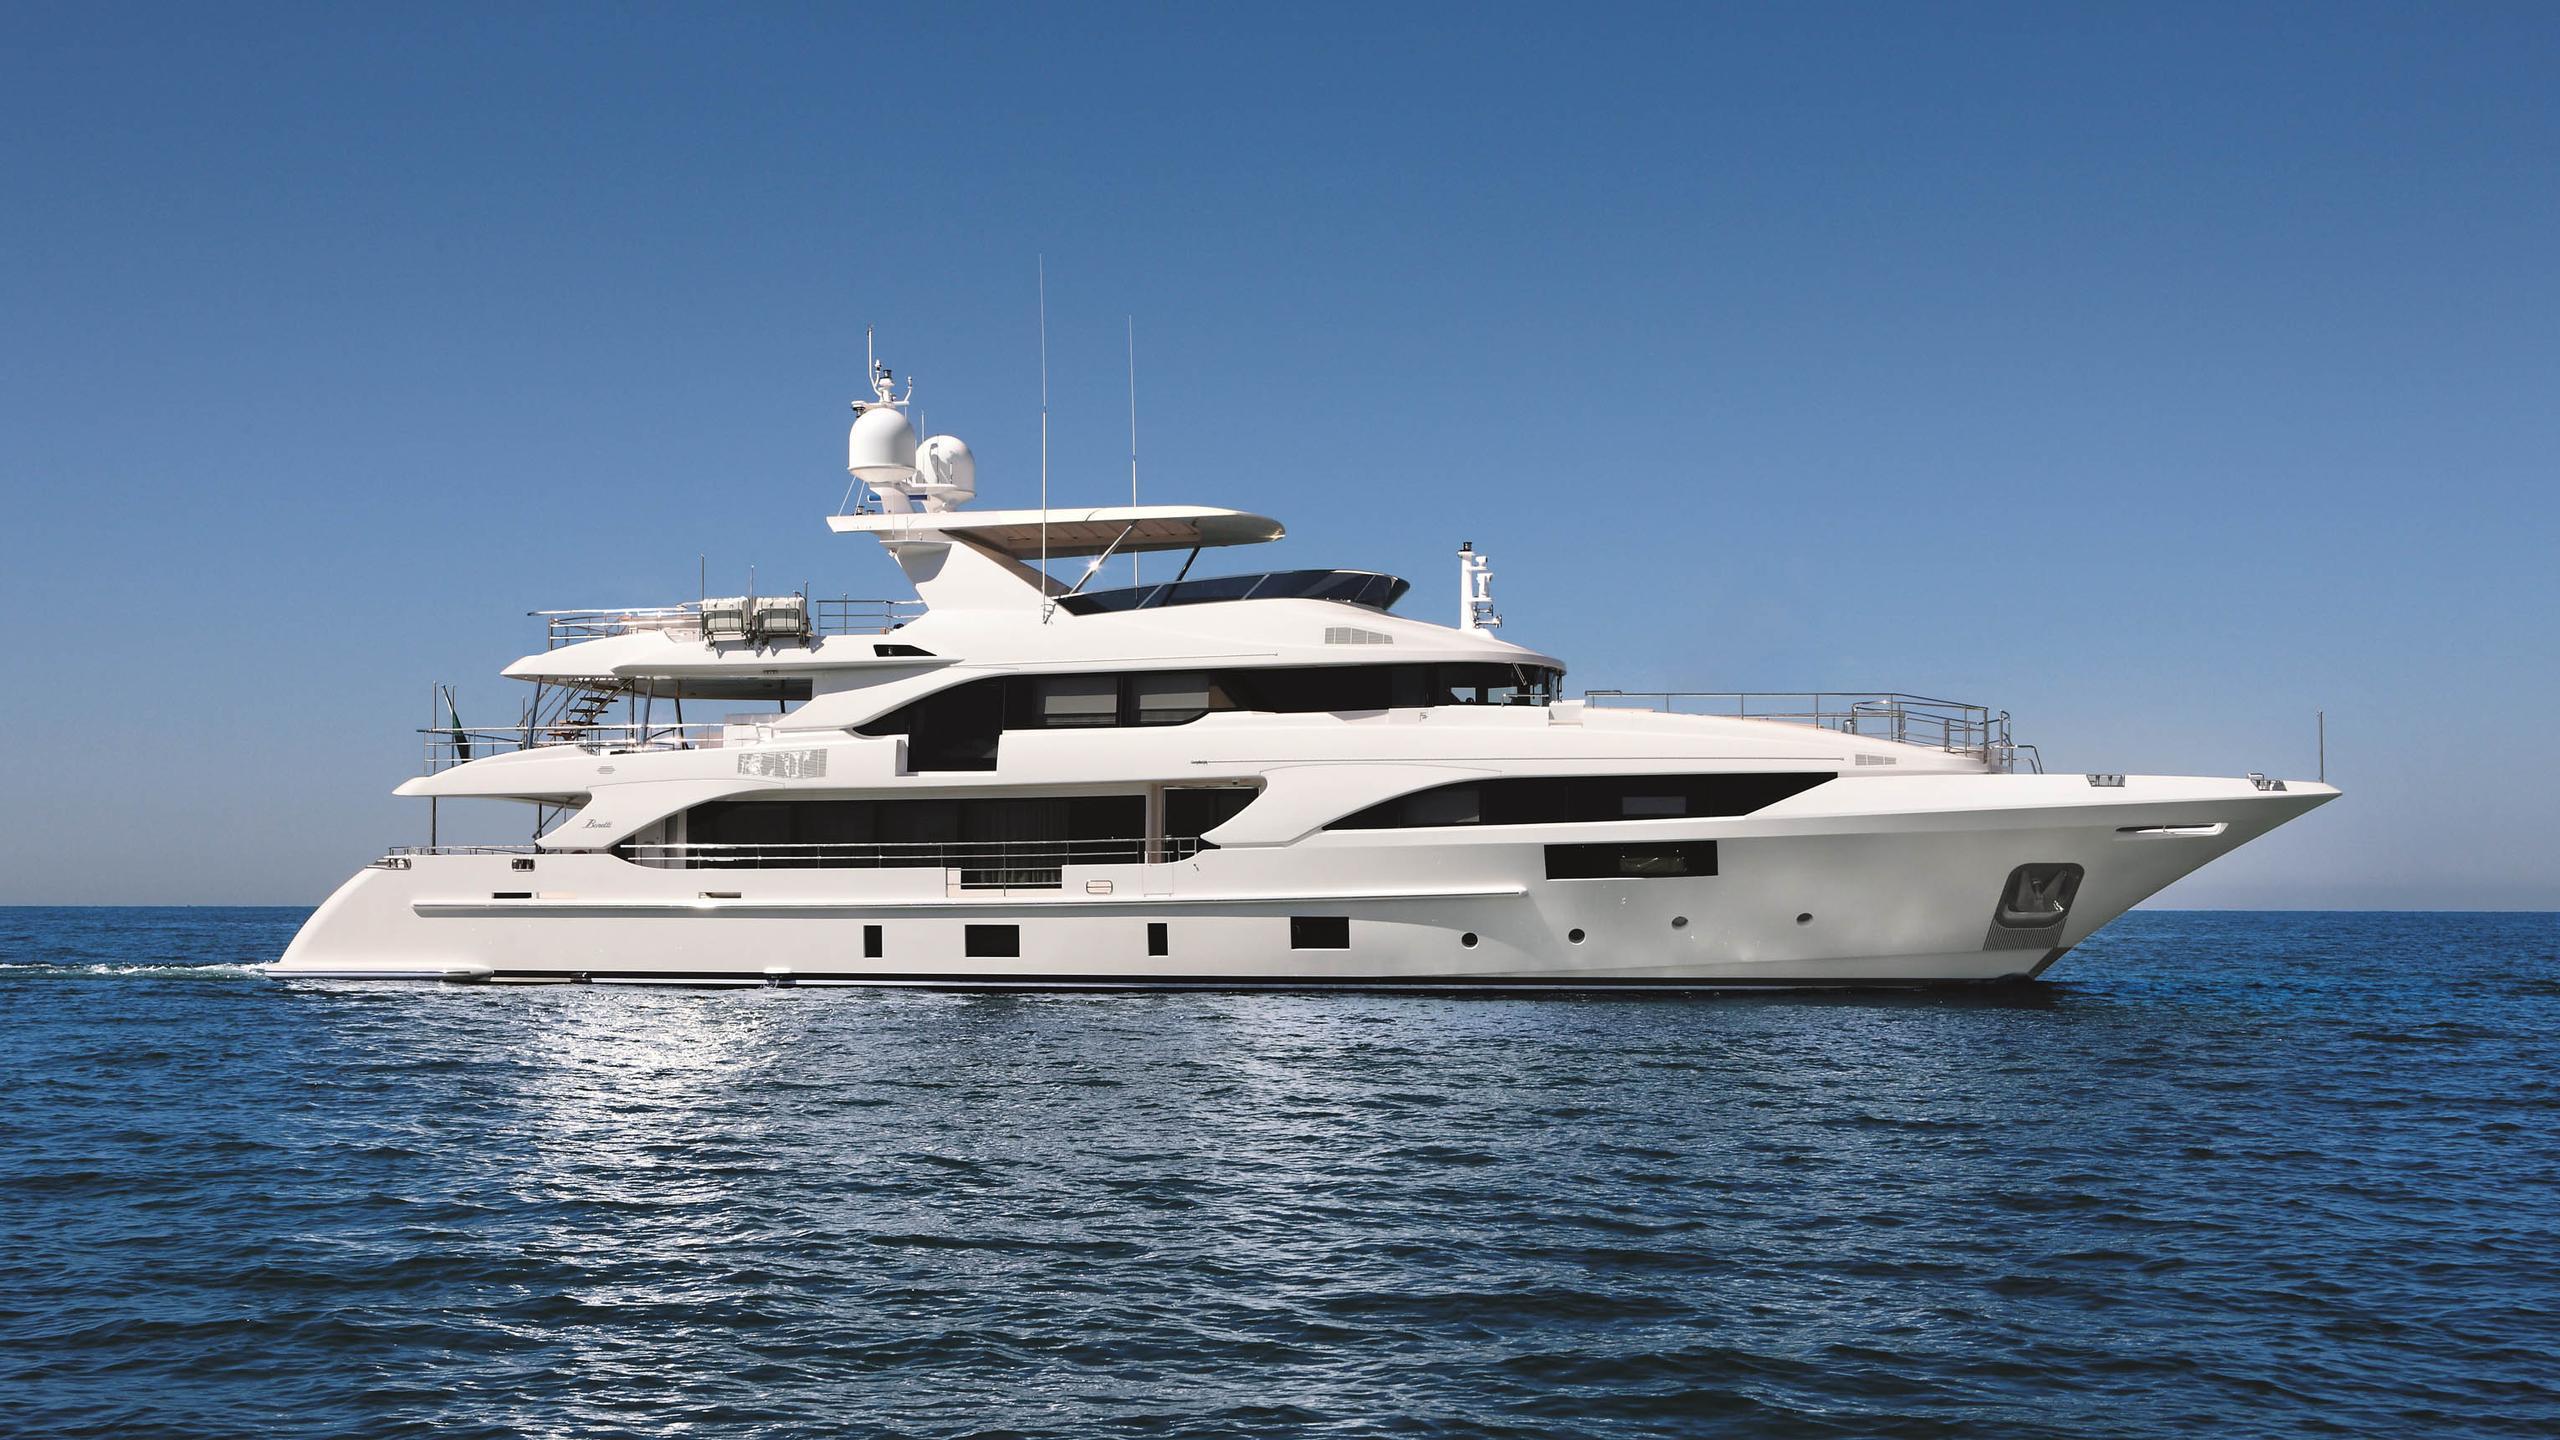 supreme 132 hemabejo motoryacht benetti yachts 40m 2014 profile sistership